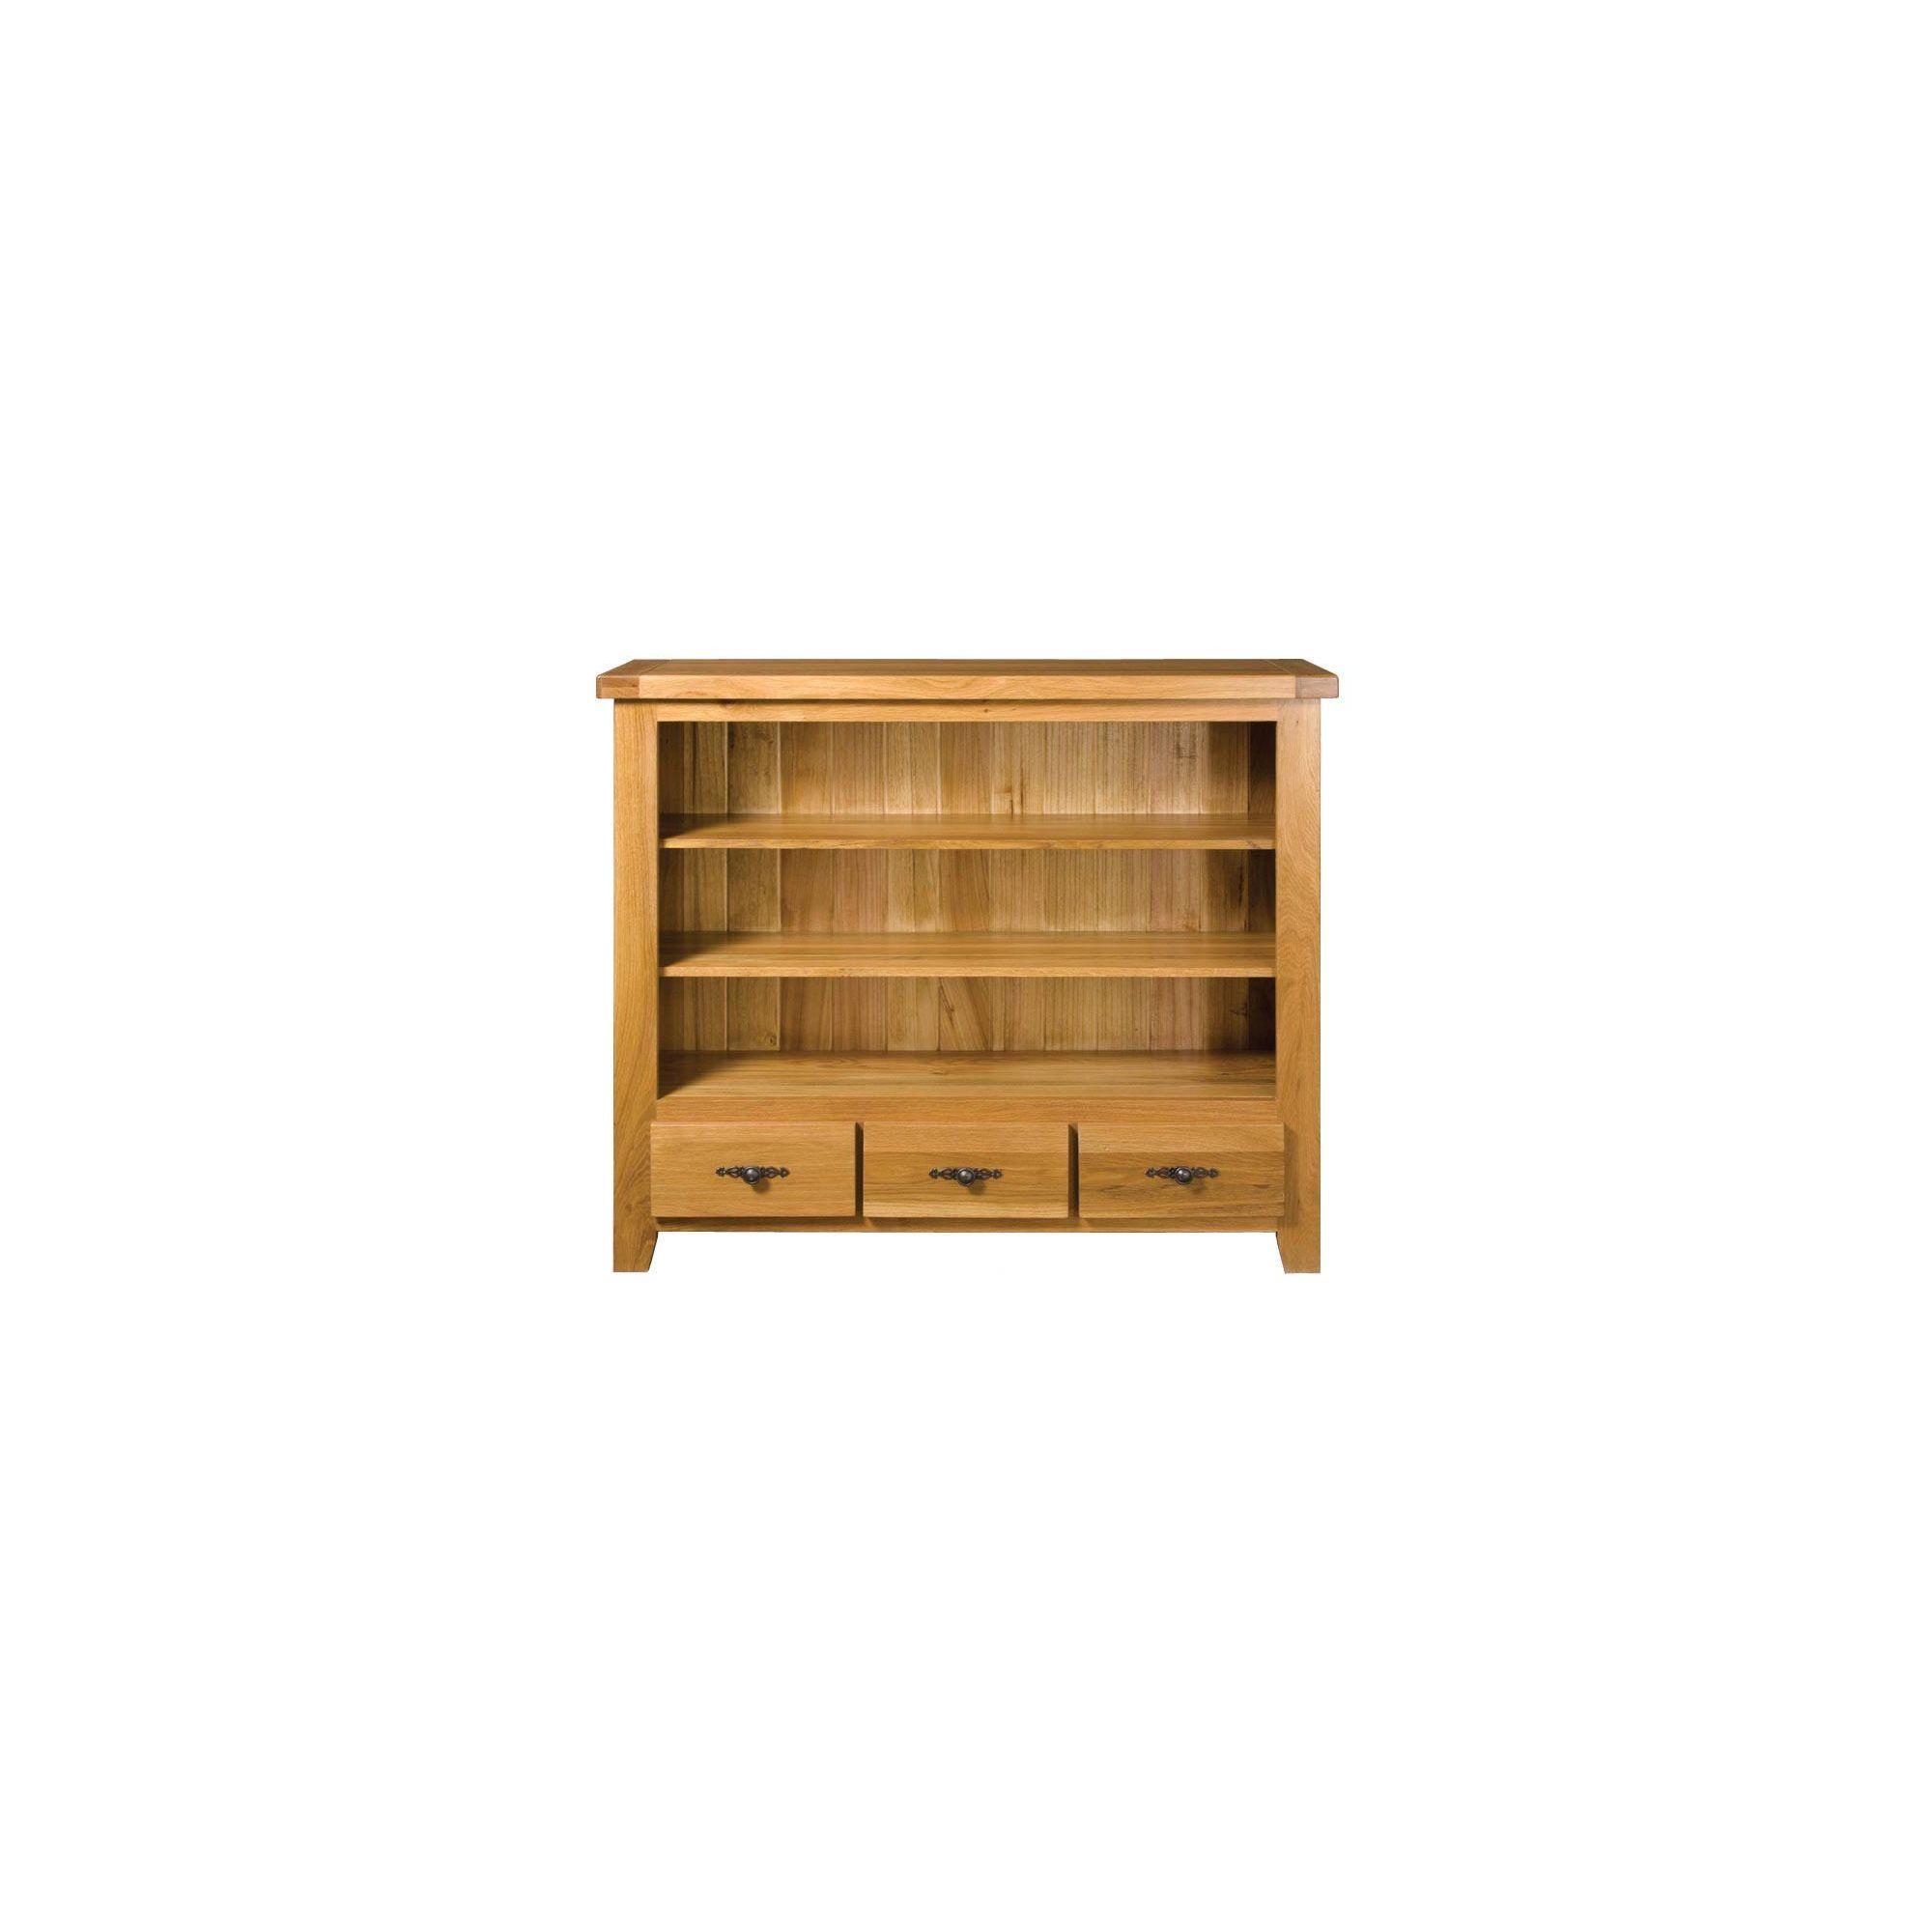 Alterton Furniture Marlborough 3 Drawer Bookcase at Tesco Direct